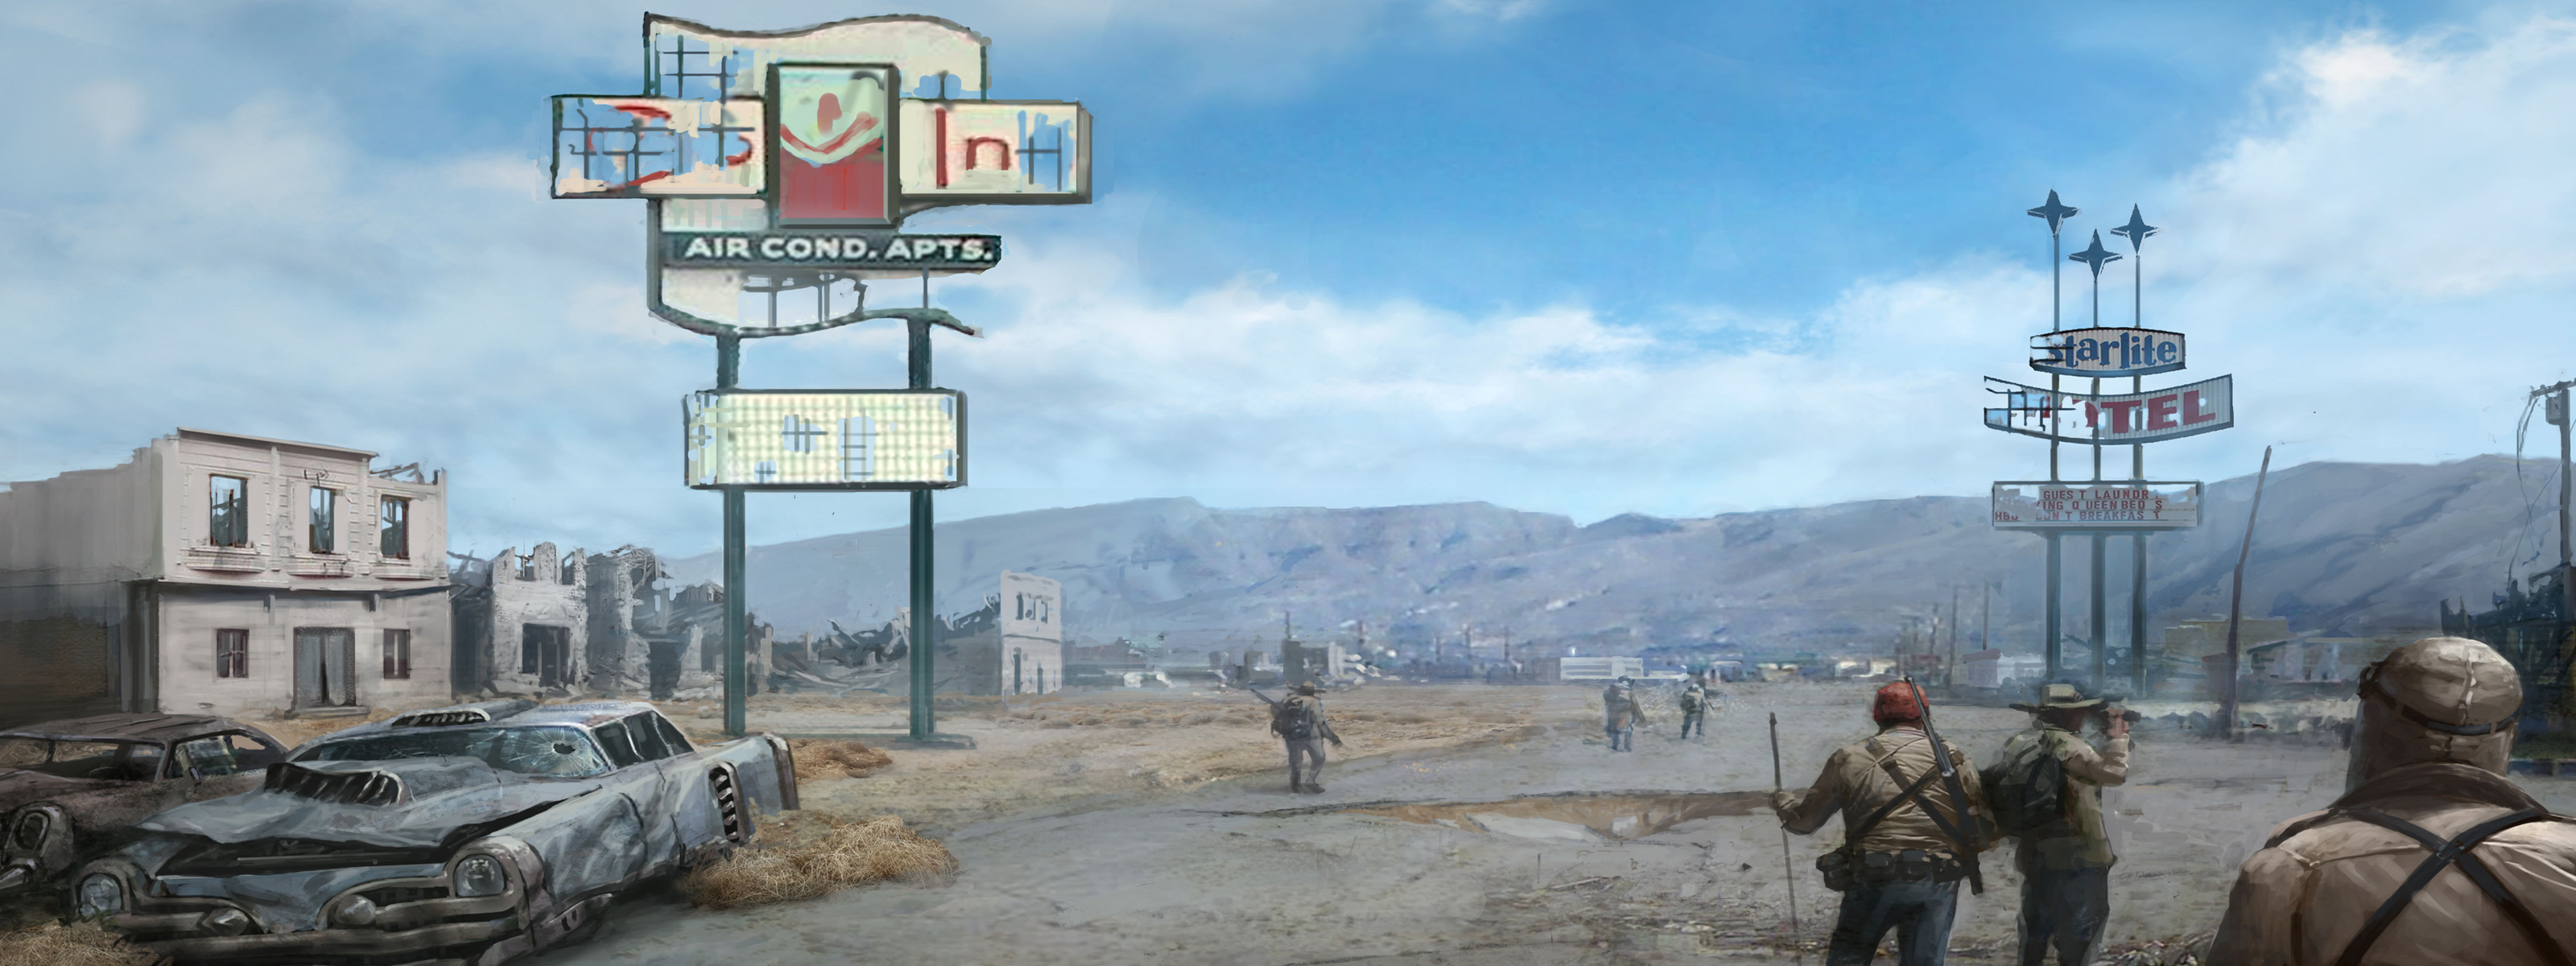 Fallout New Vegas Dual Monitor Wallpaper 3200x1200